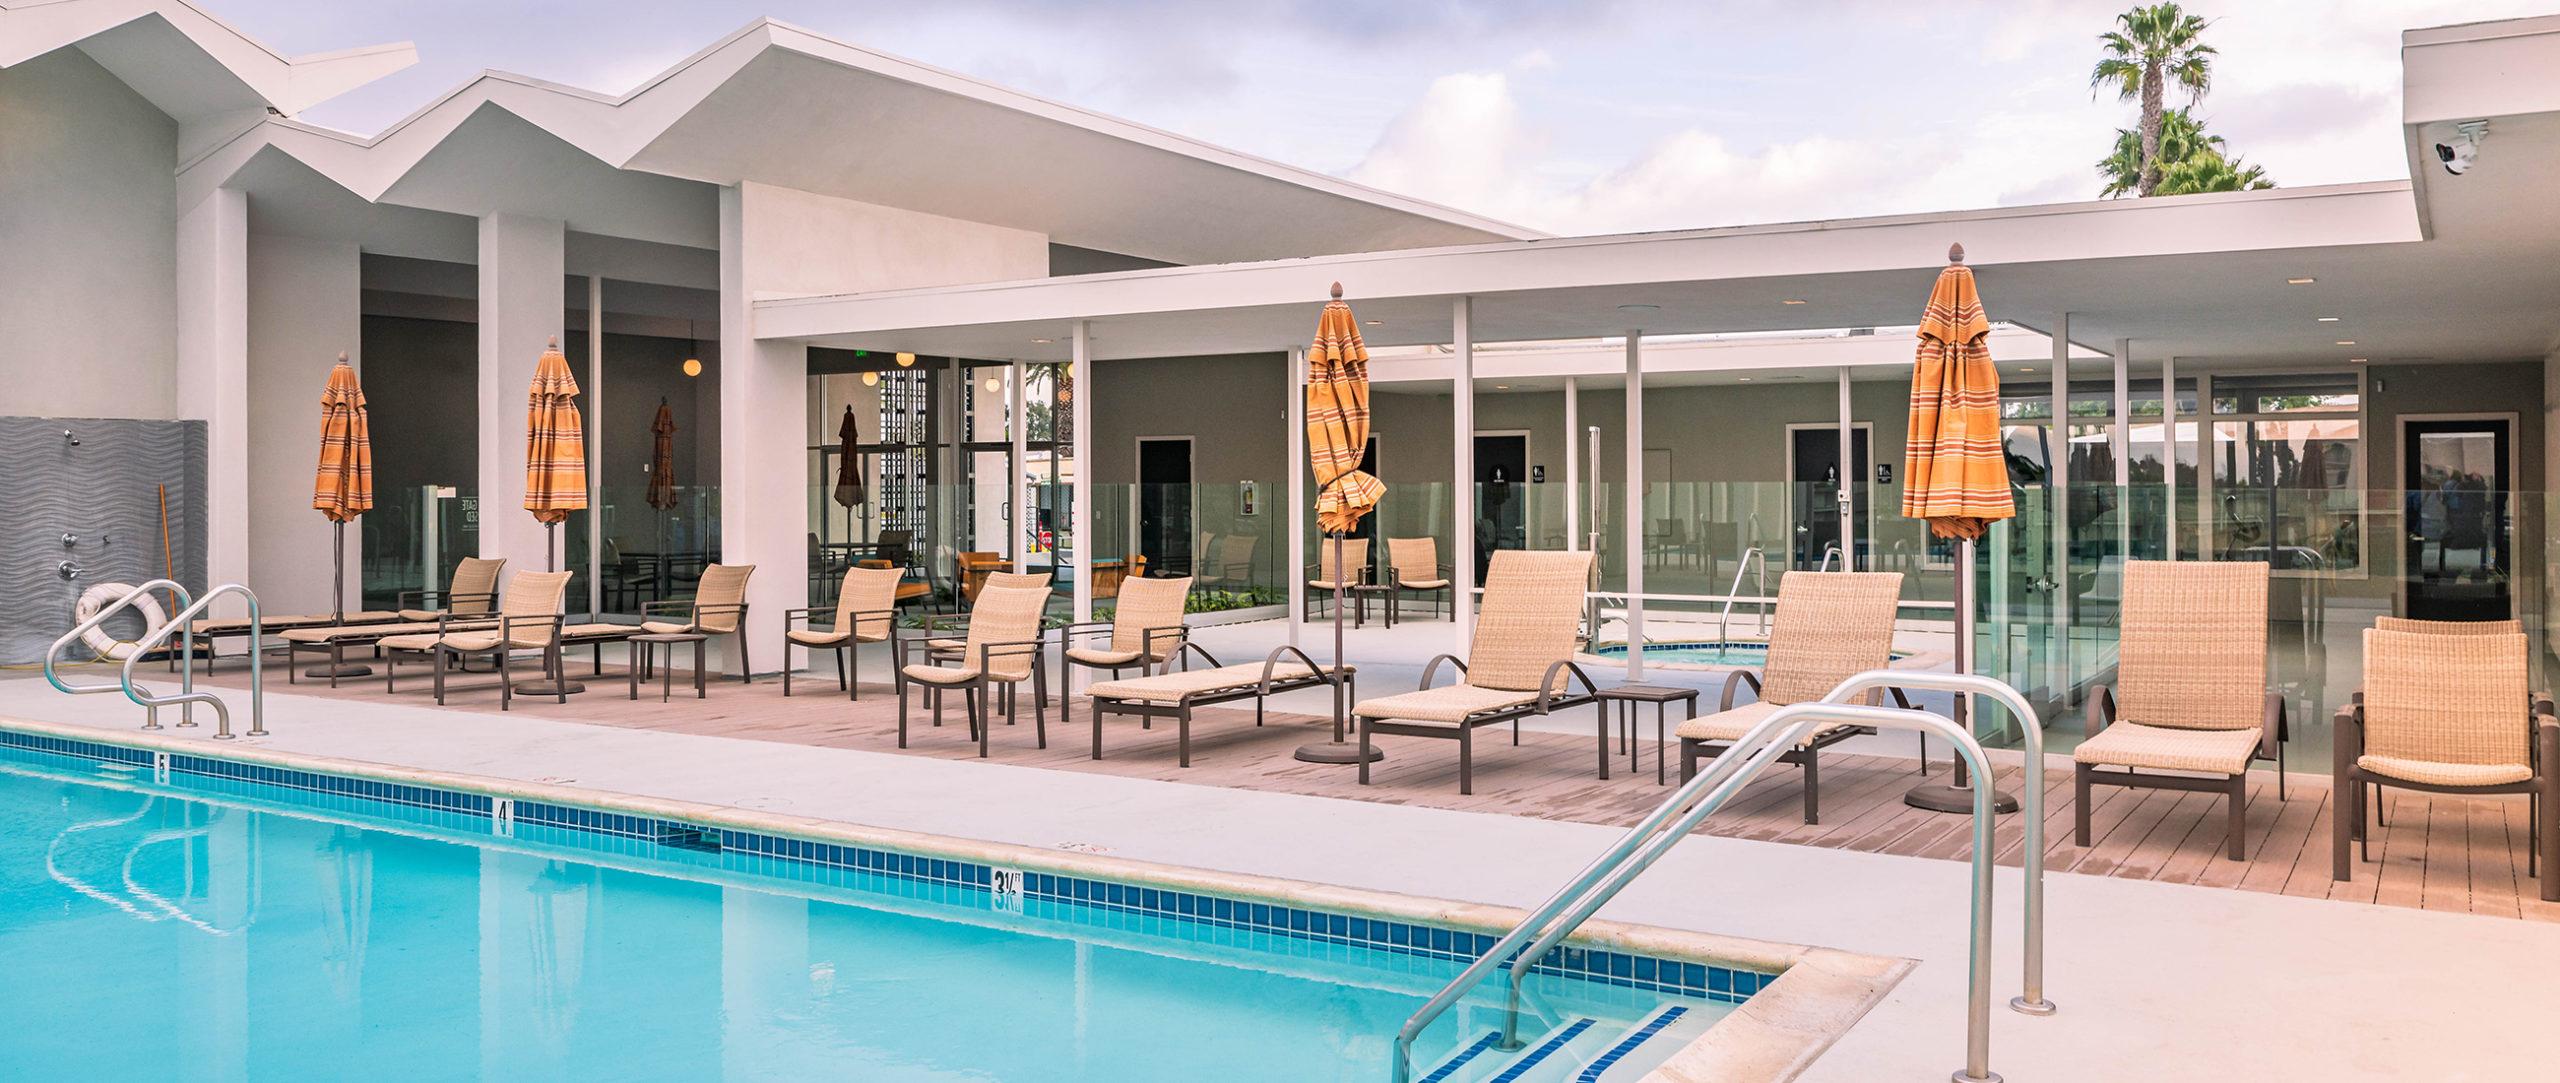 Pool, spa, and lounge area